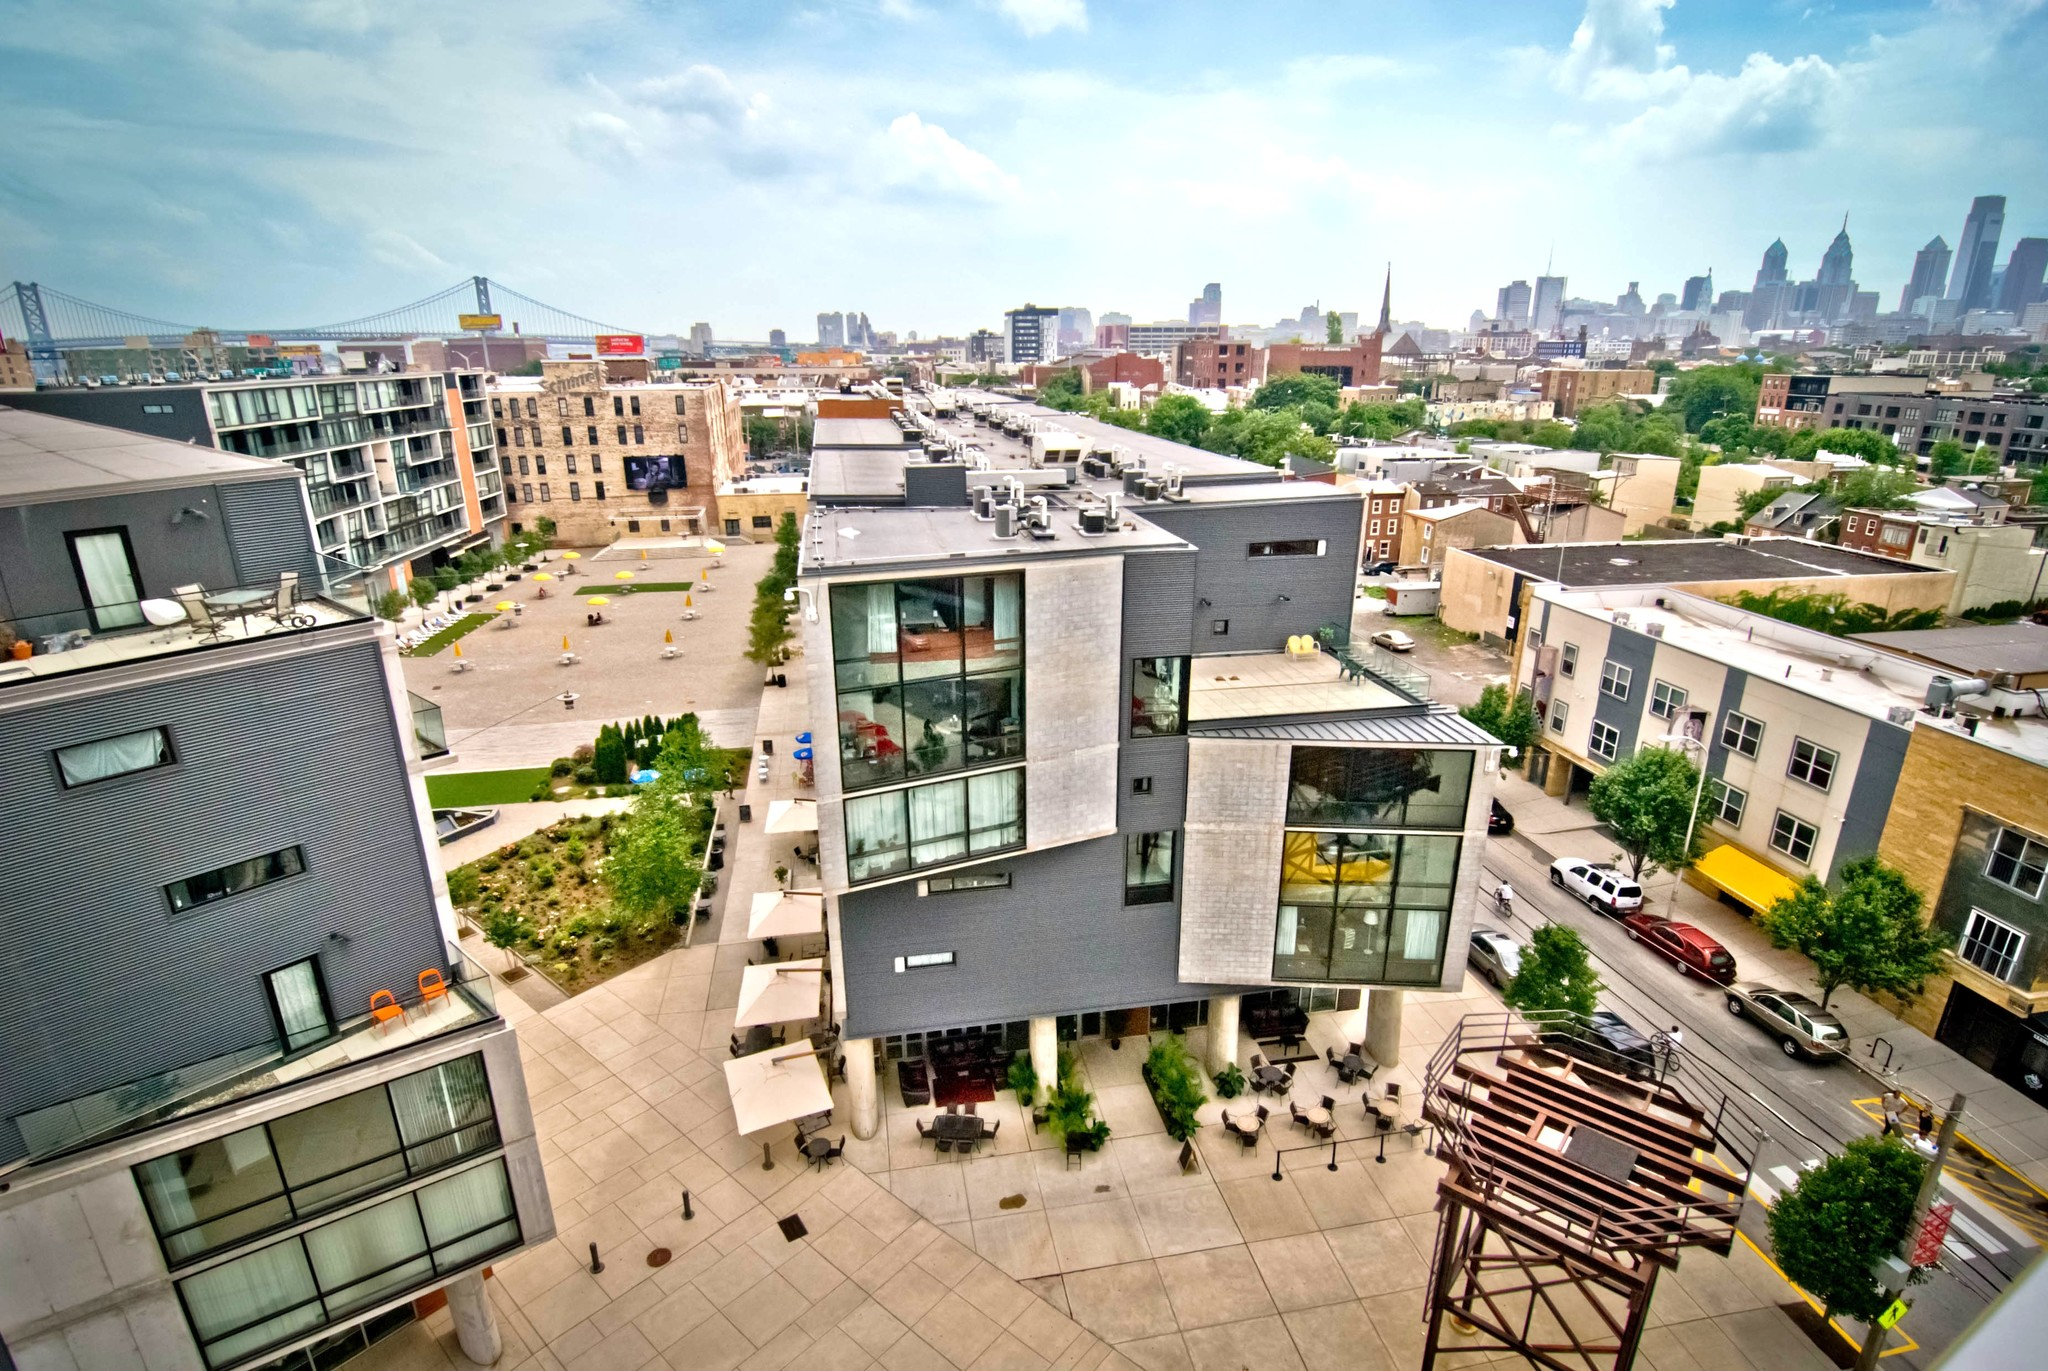 the-piazza-philadelphia-pa-piazza-courtyard.jpg